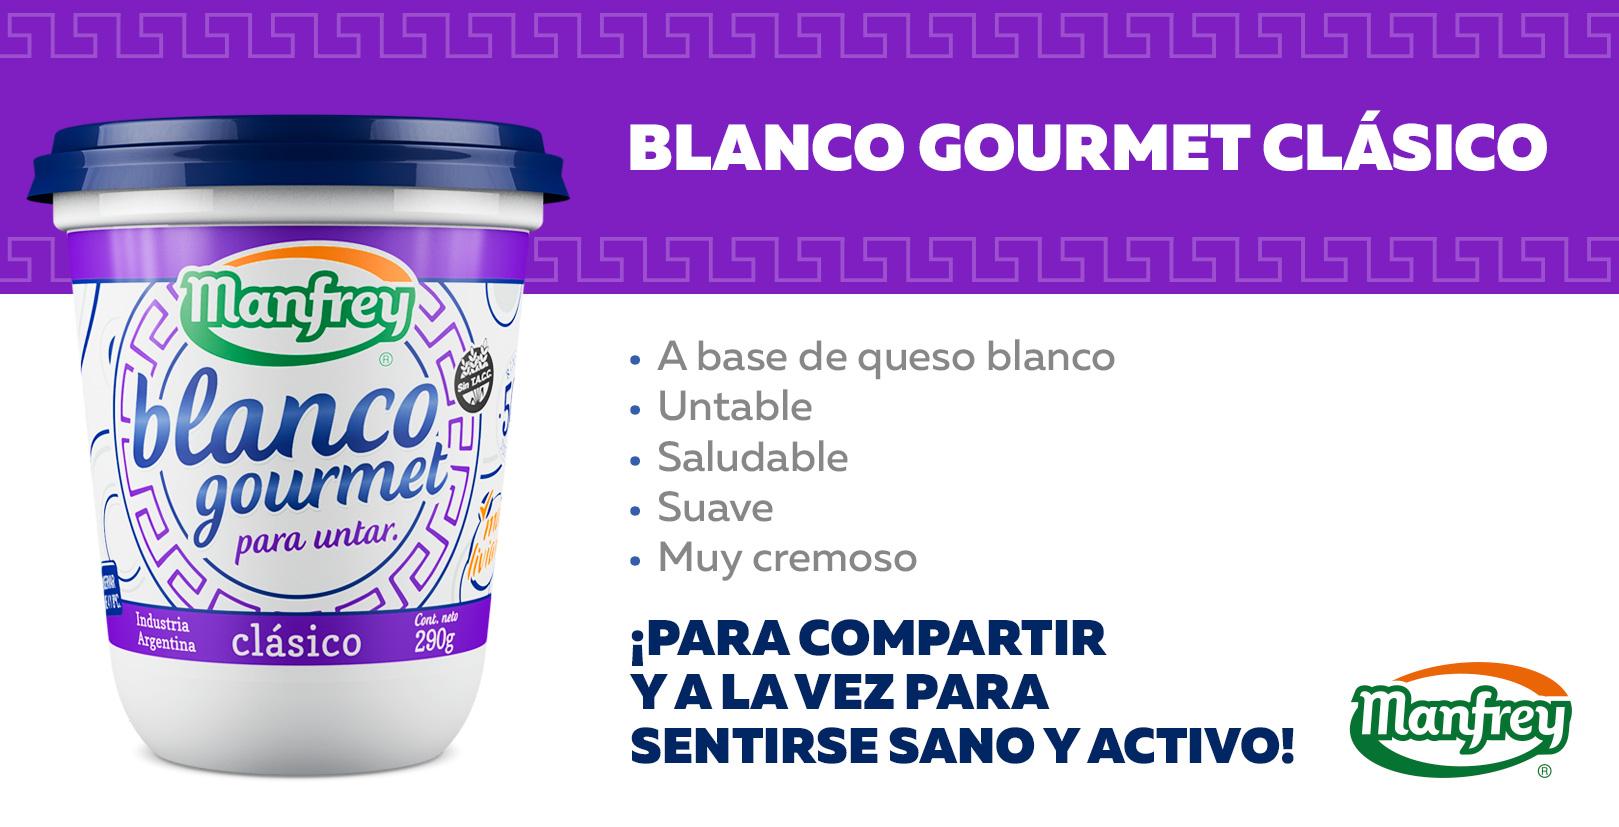 Blanco Gourmet Clásico